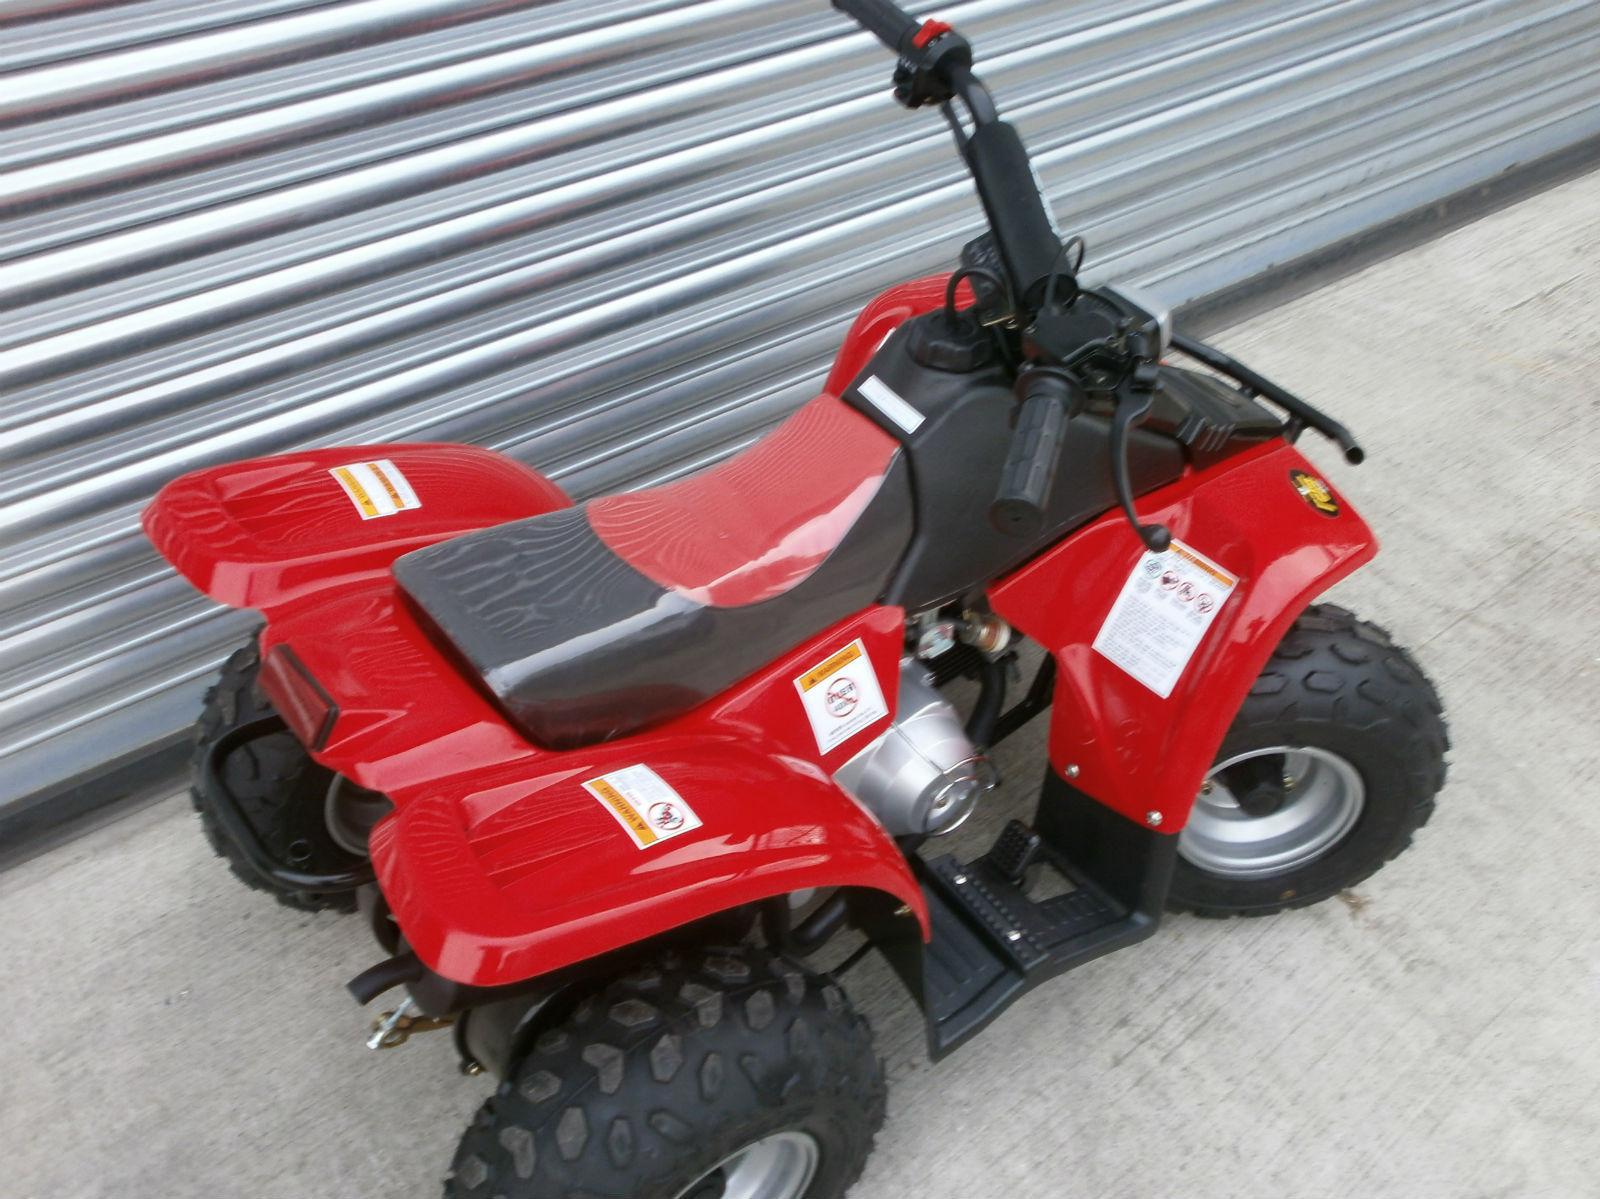 Kazuma Meerkat 50cc Chinese ATV Owners Manual